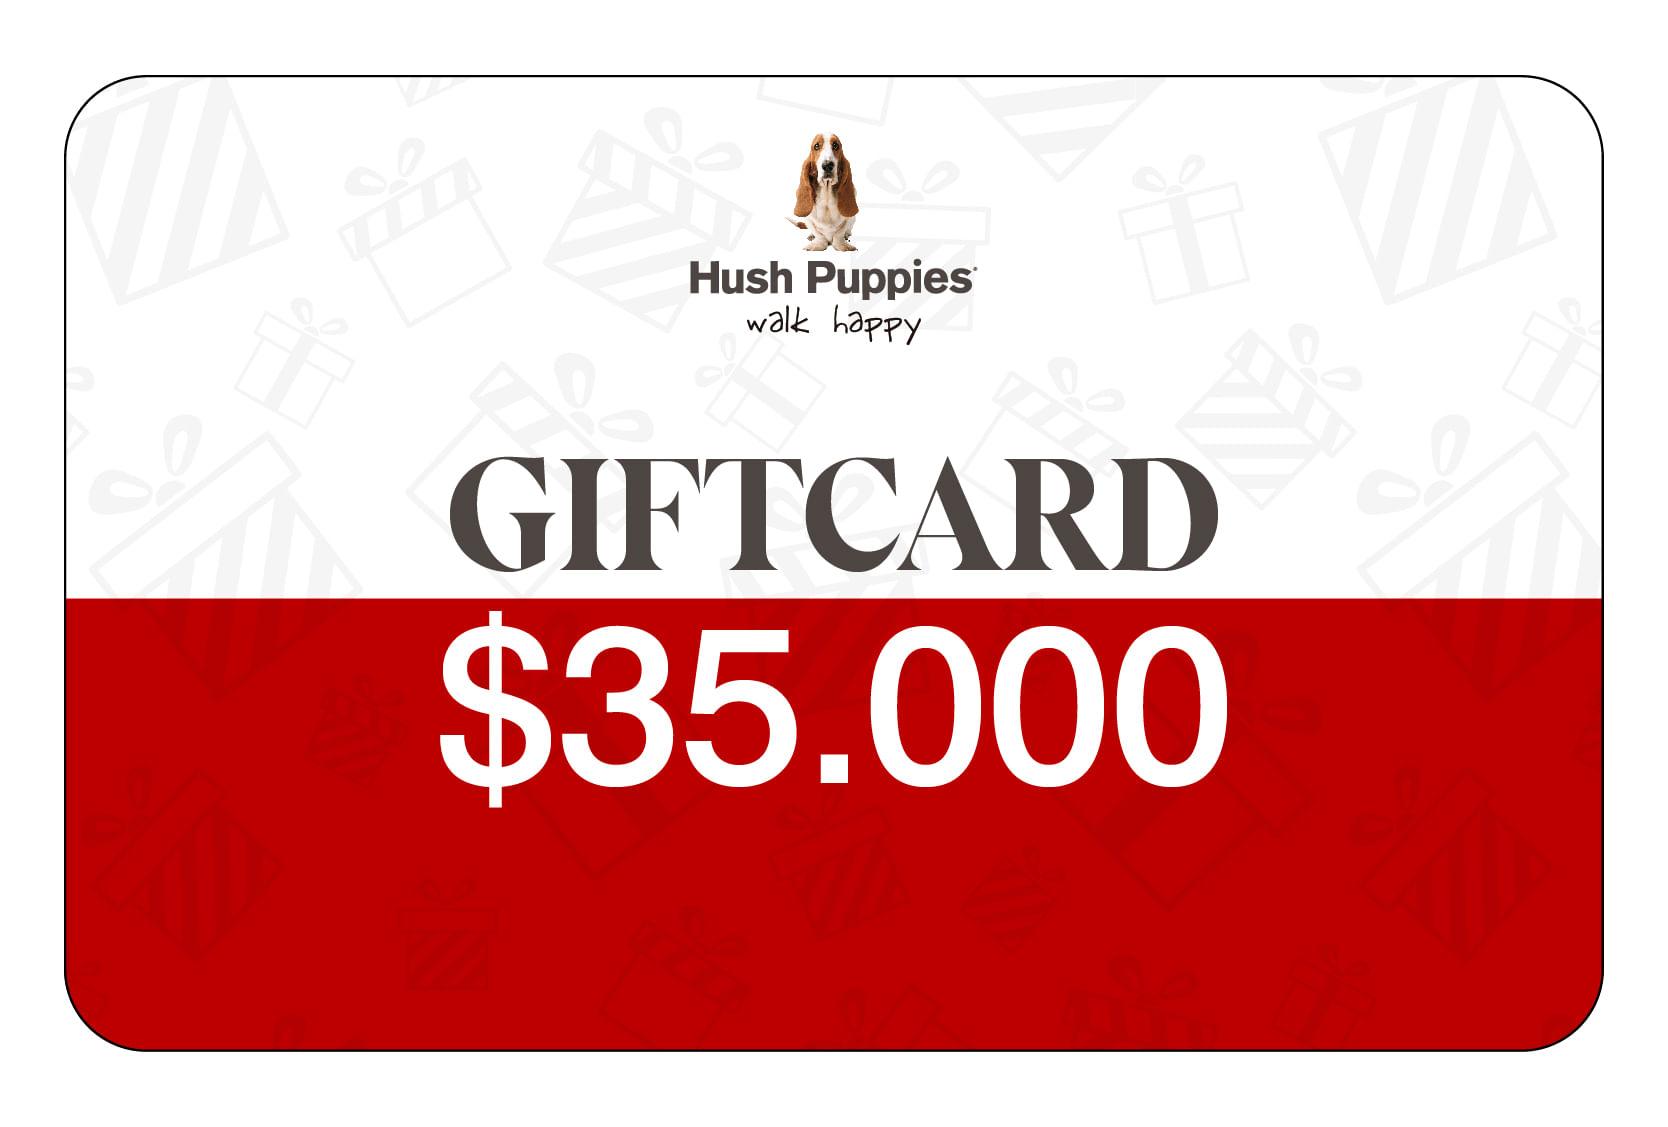 Gift Card $35.000